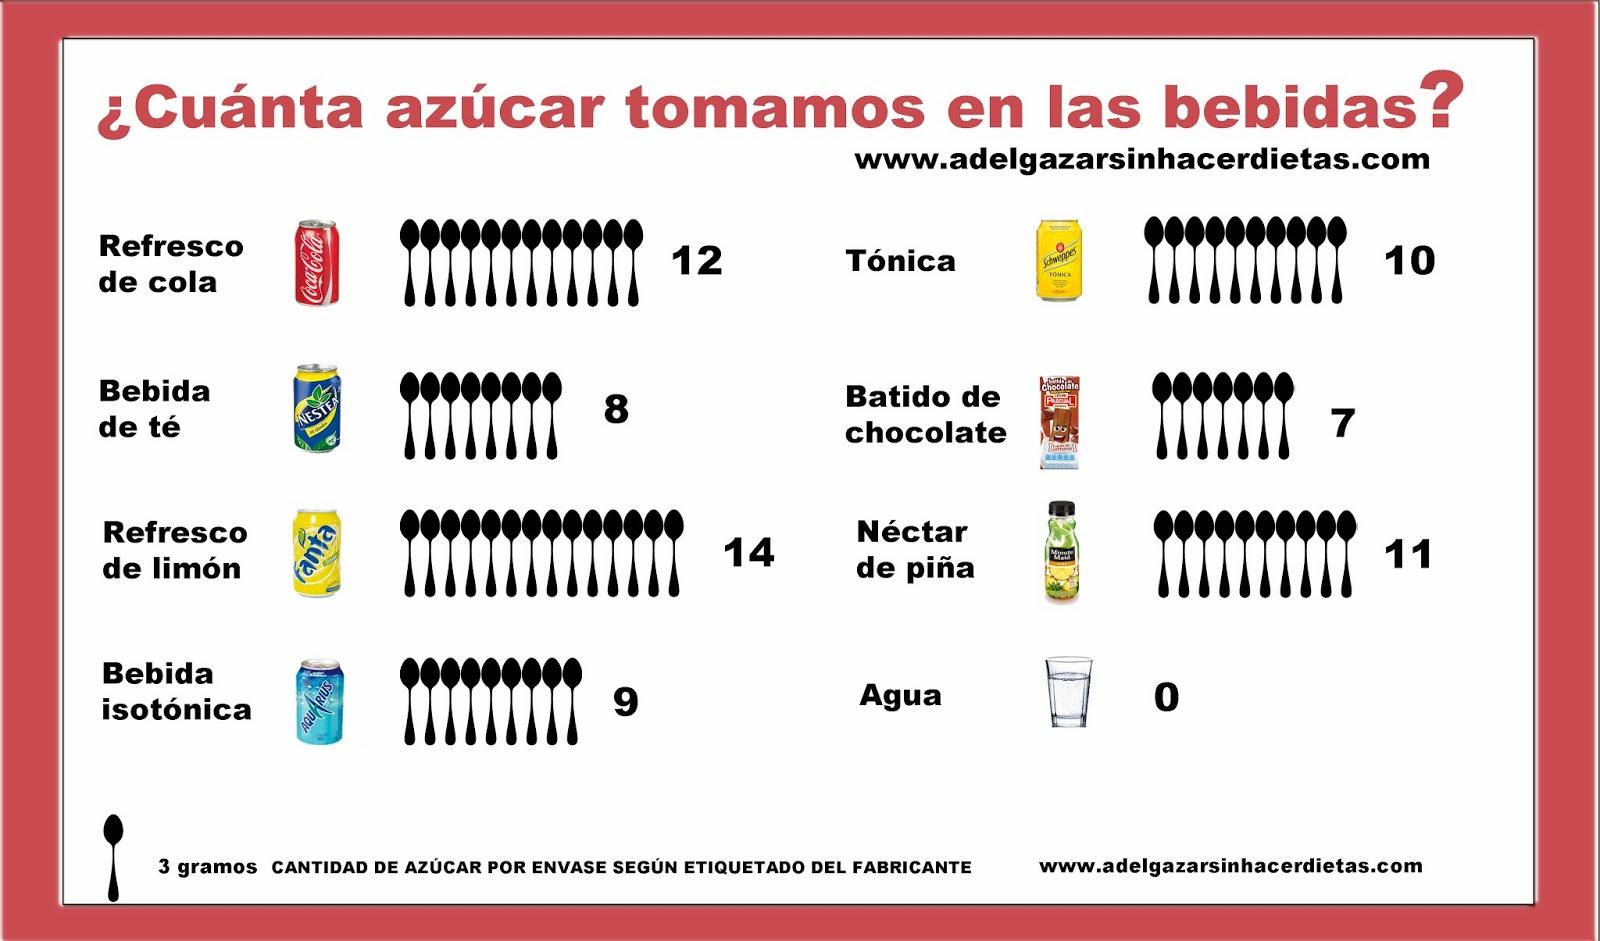 www.adelgazarsinhacerdietas.com.jpg